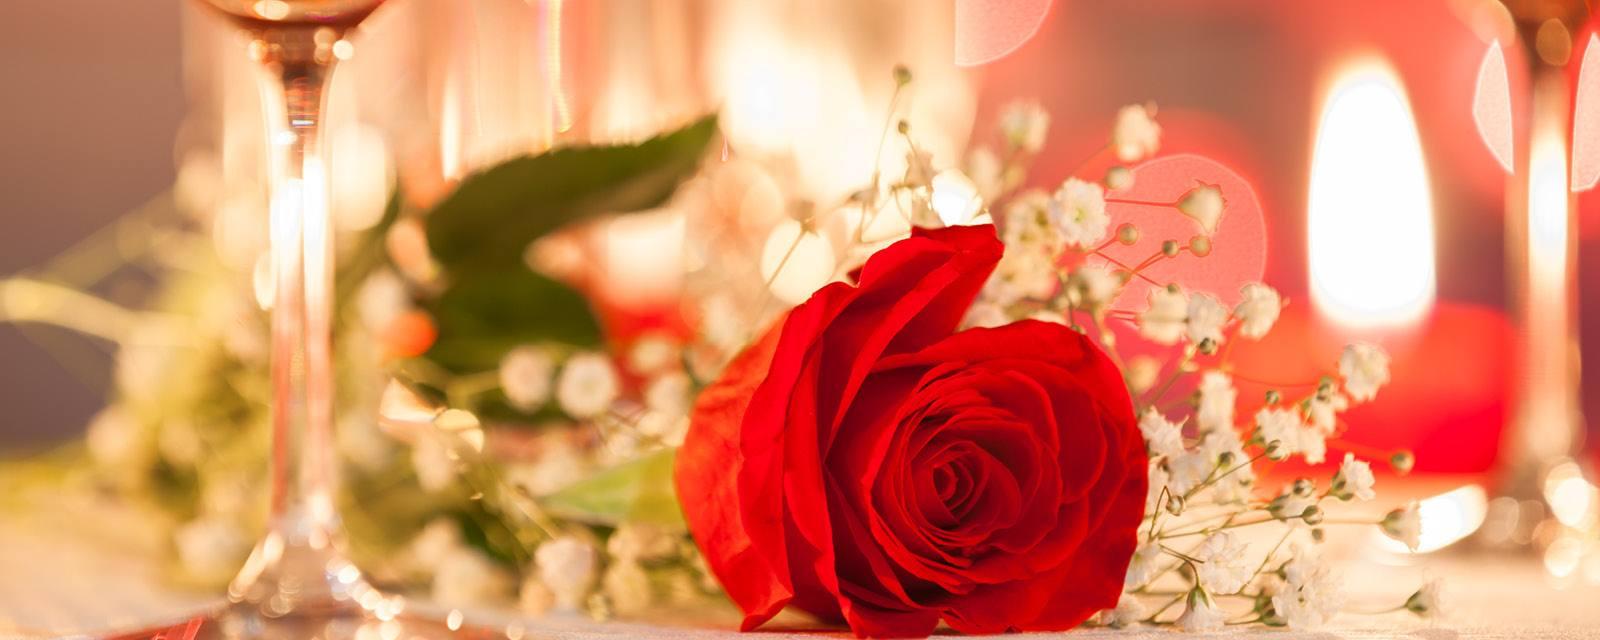 Rosen Plaza Hotel Valentine's Day In International Drive